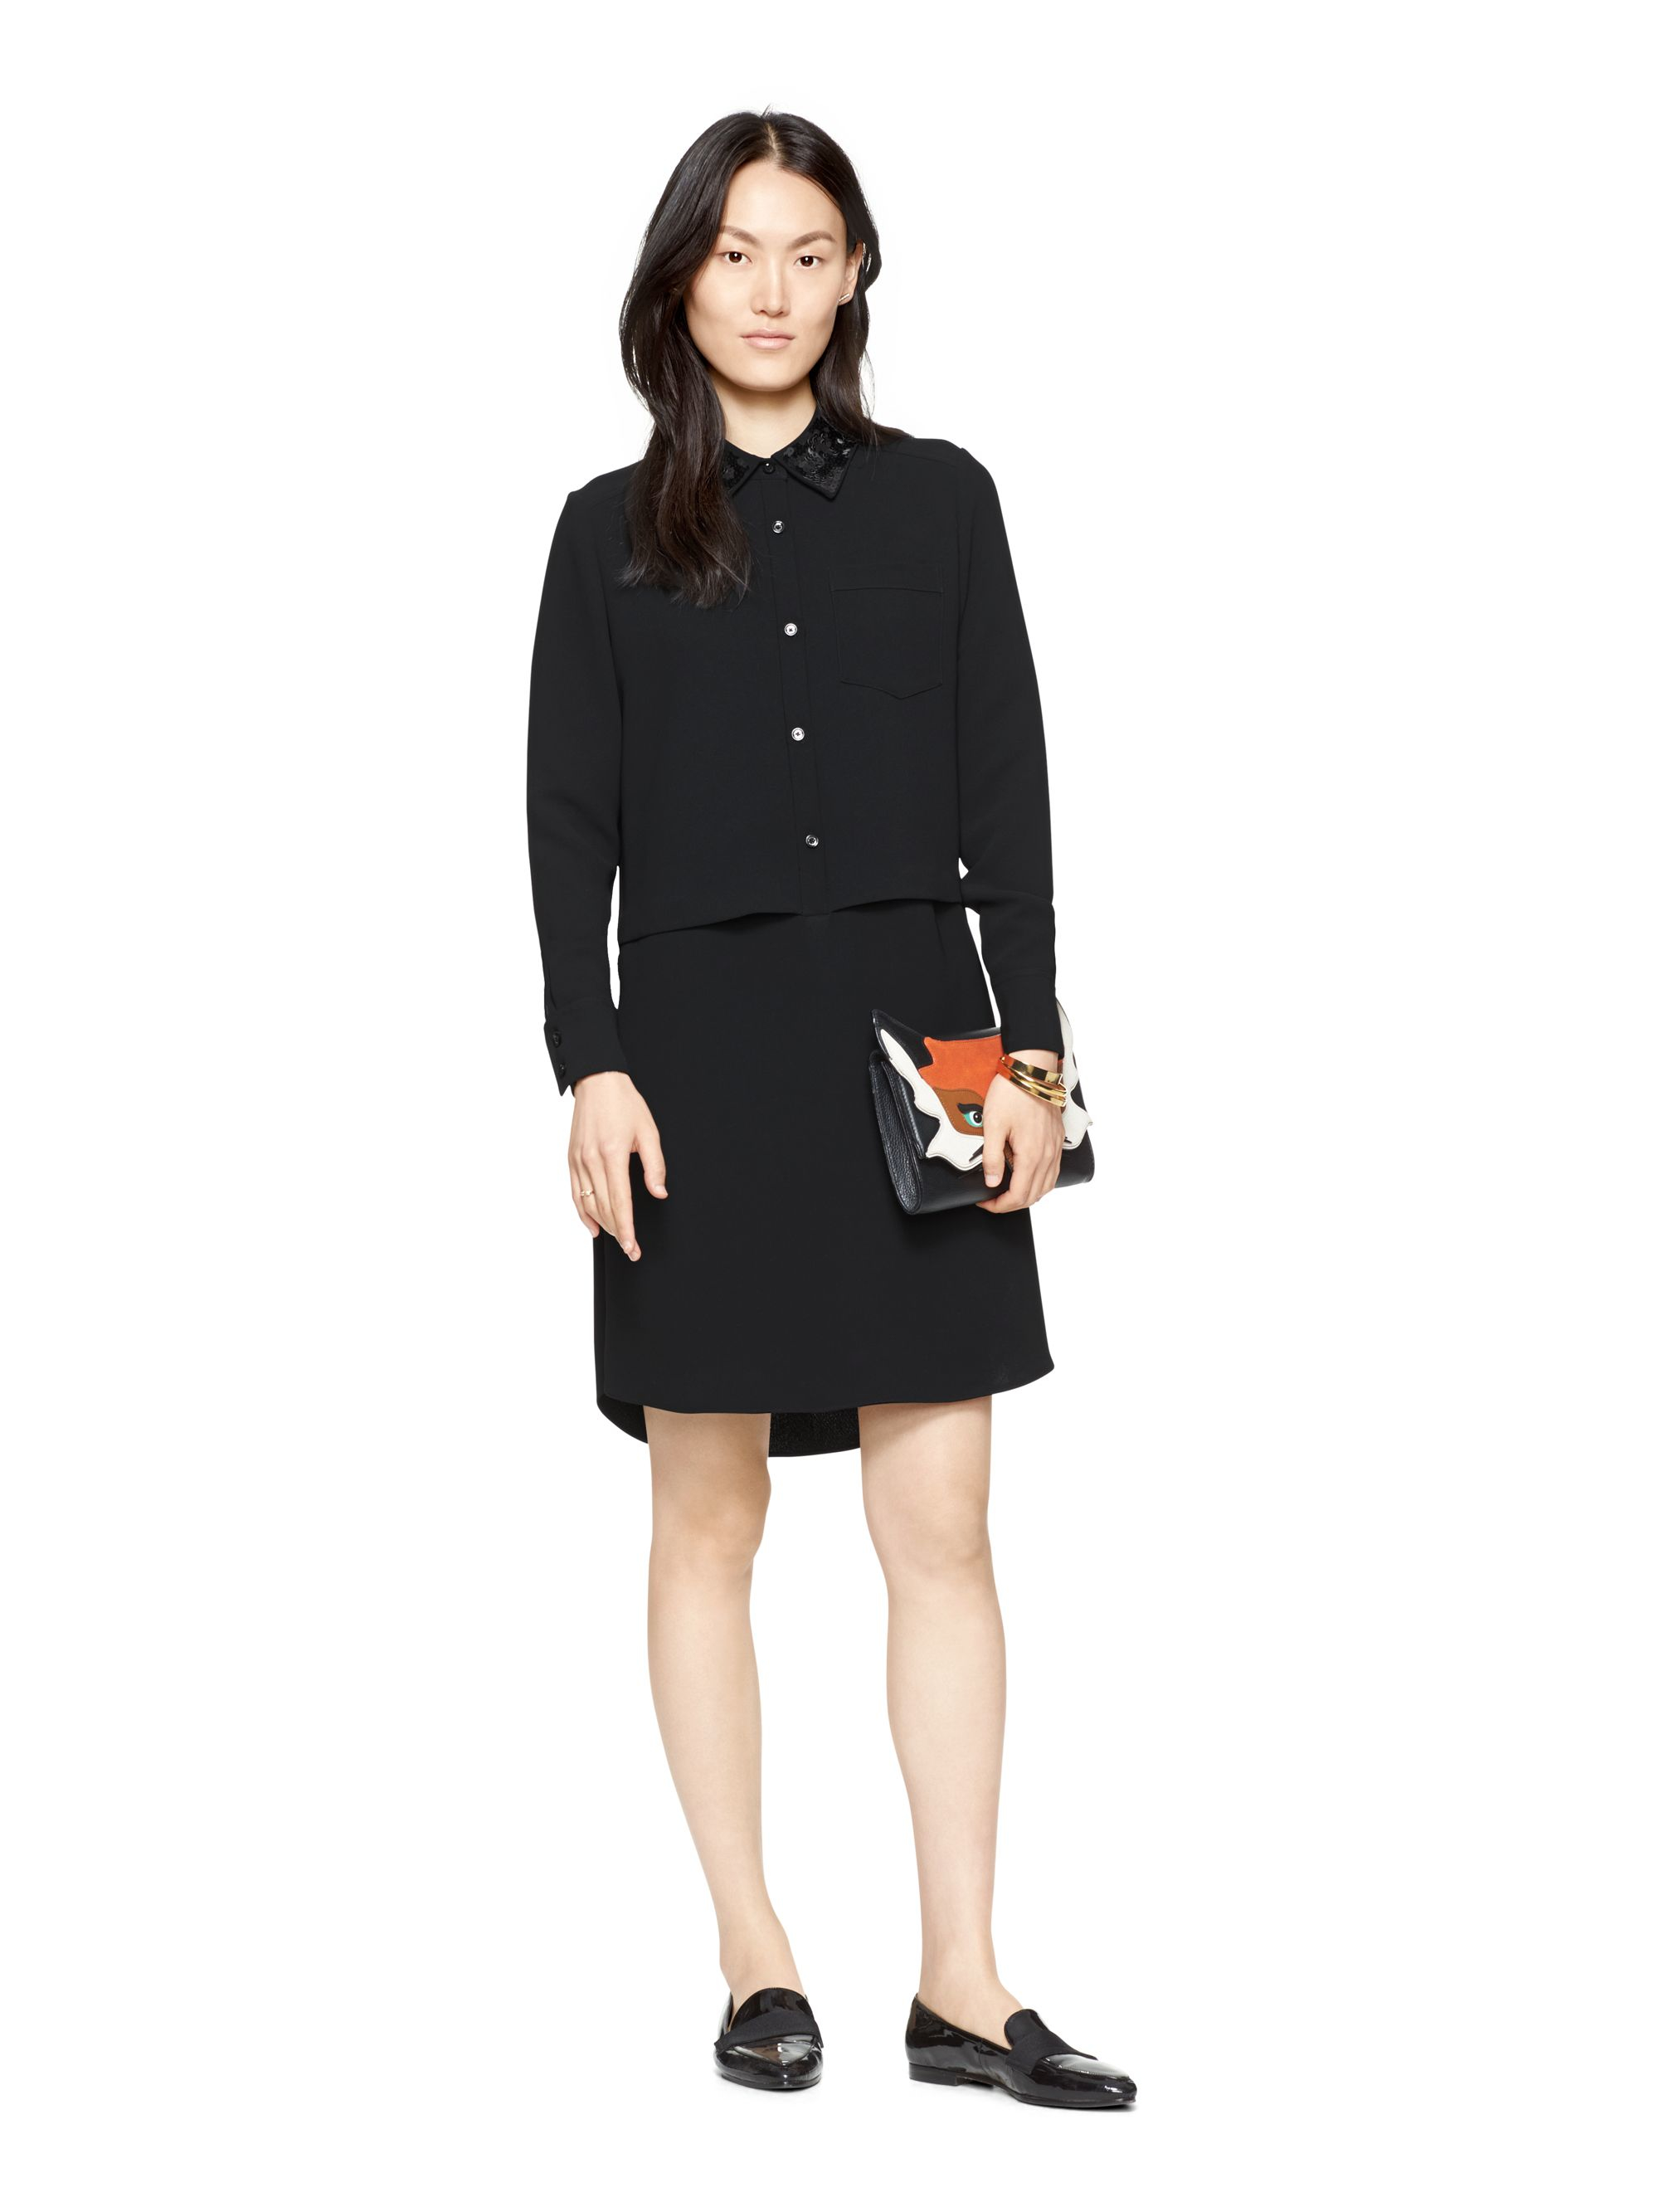 Lyst Kate Spade New York Sequin Collar Shirt Dress In Black